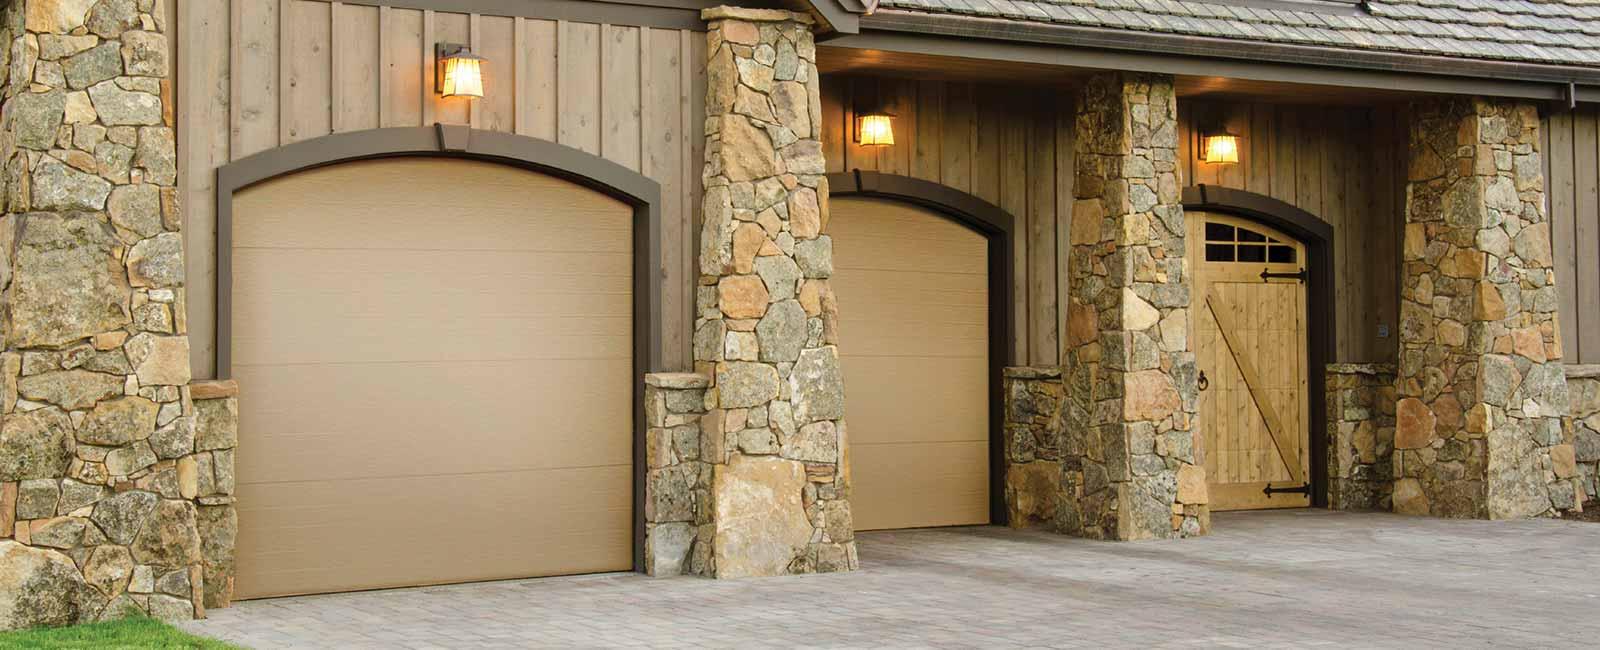 three single-car flush panel garage doors